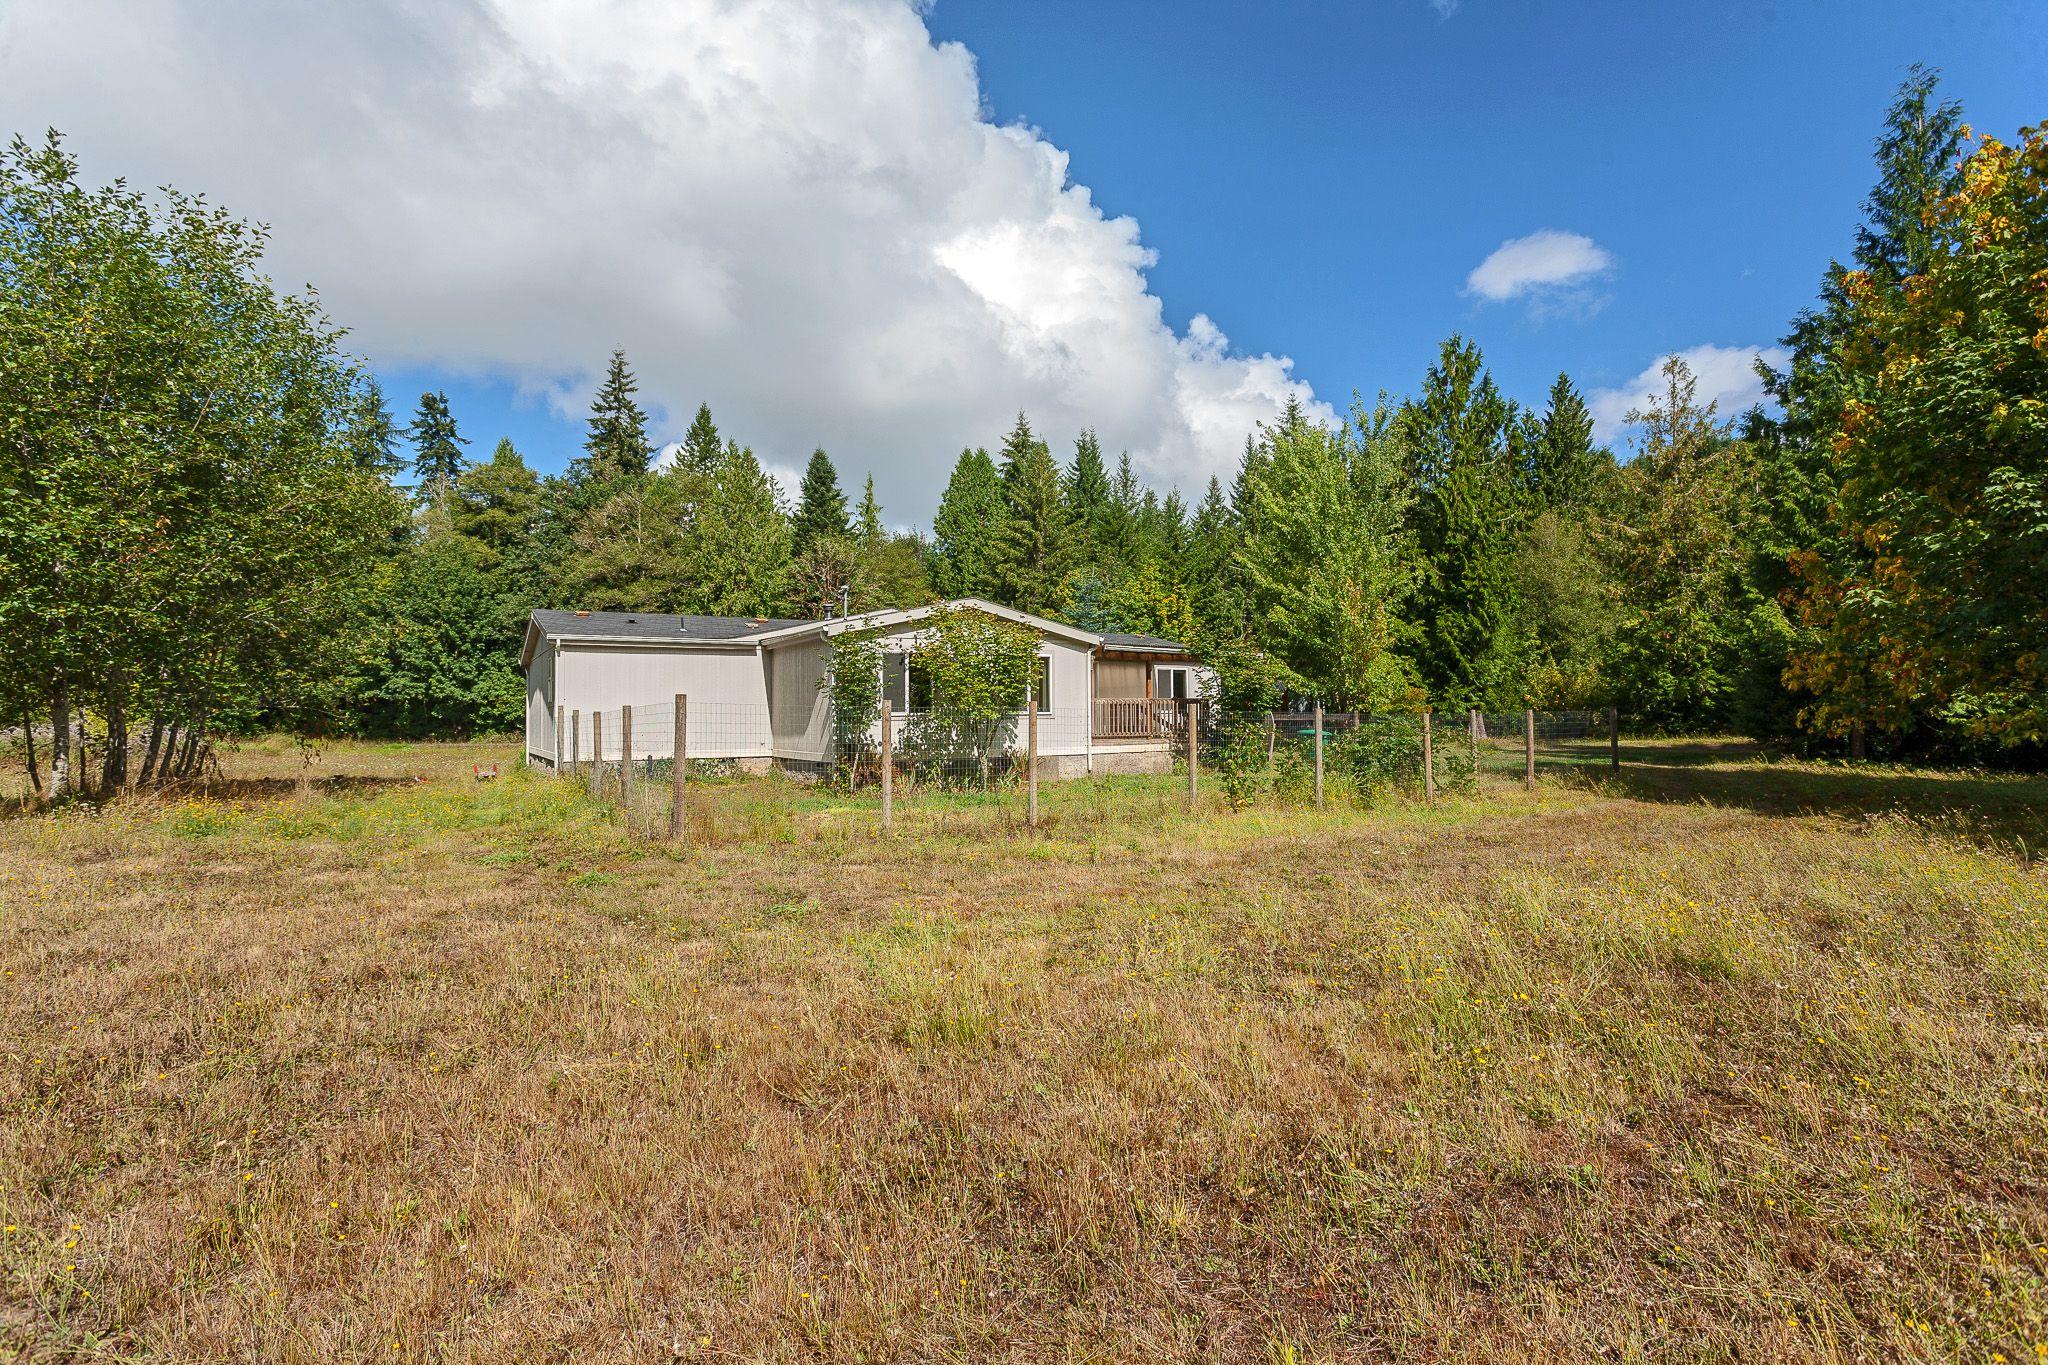 HUD Home, Keasey Rd, Vernonia, Oregon. This incredible